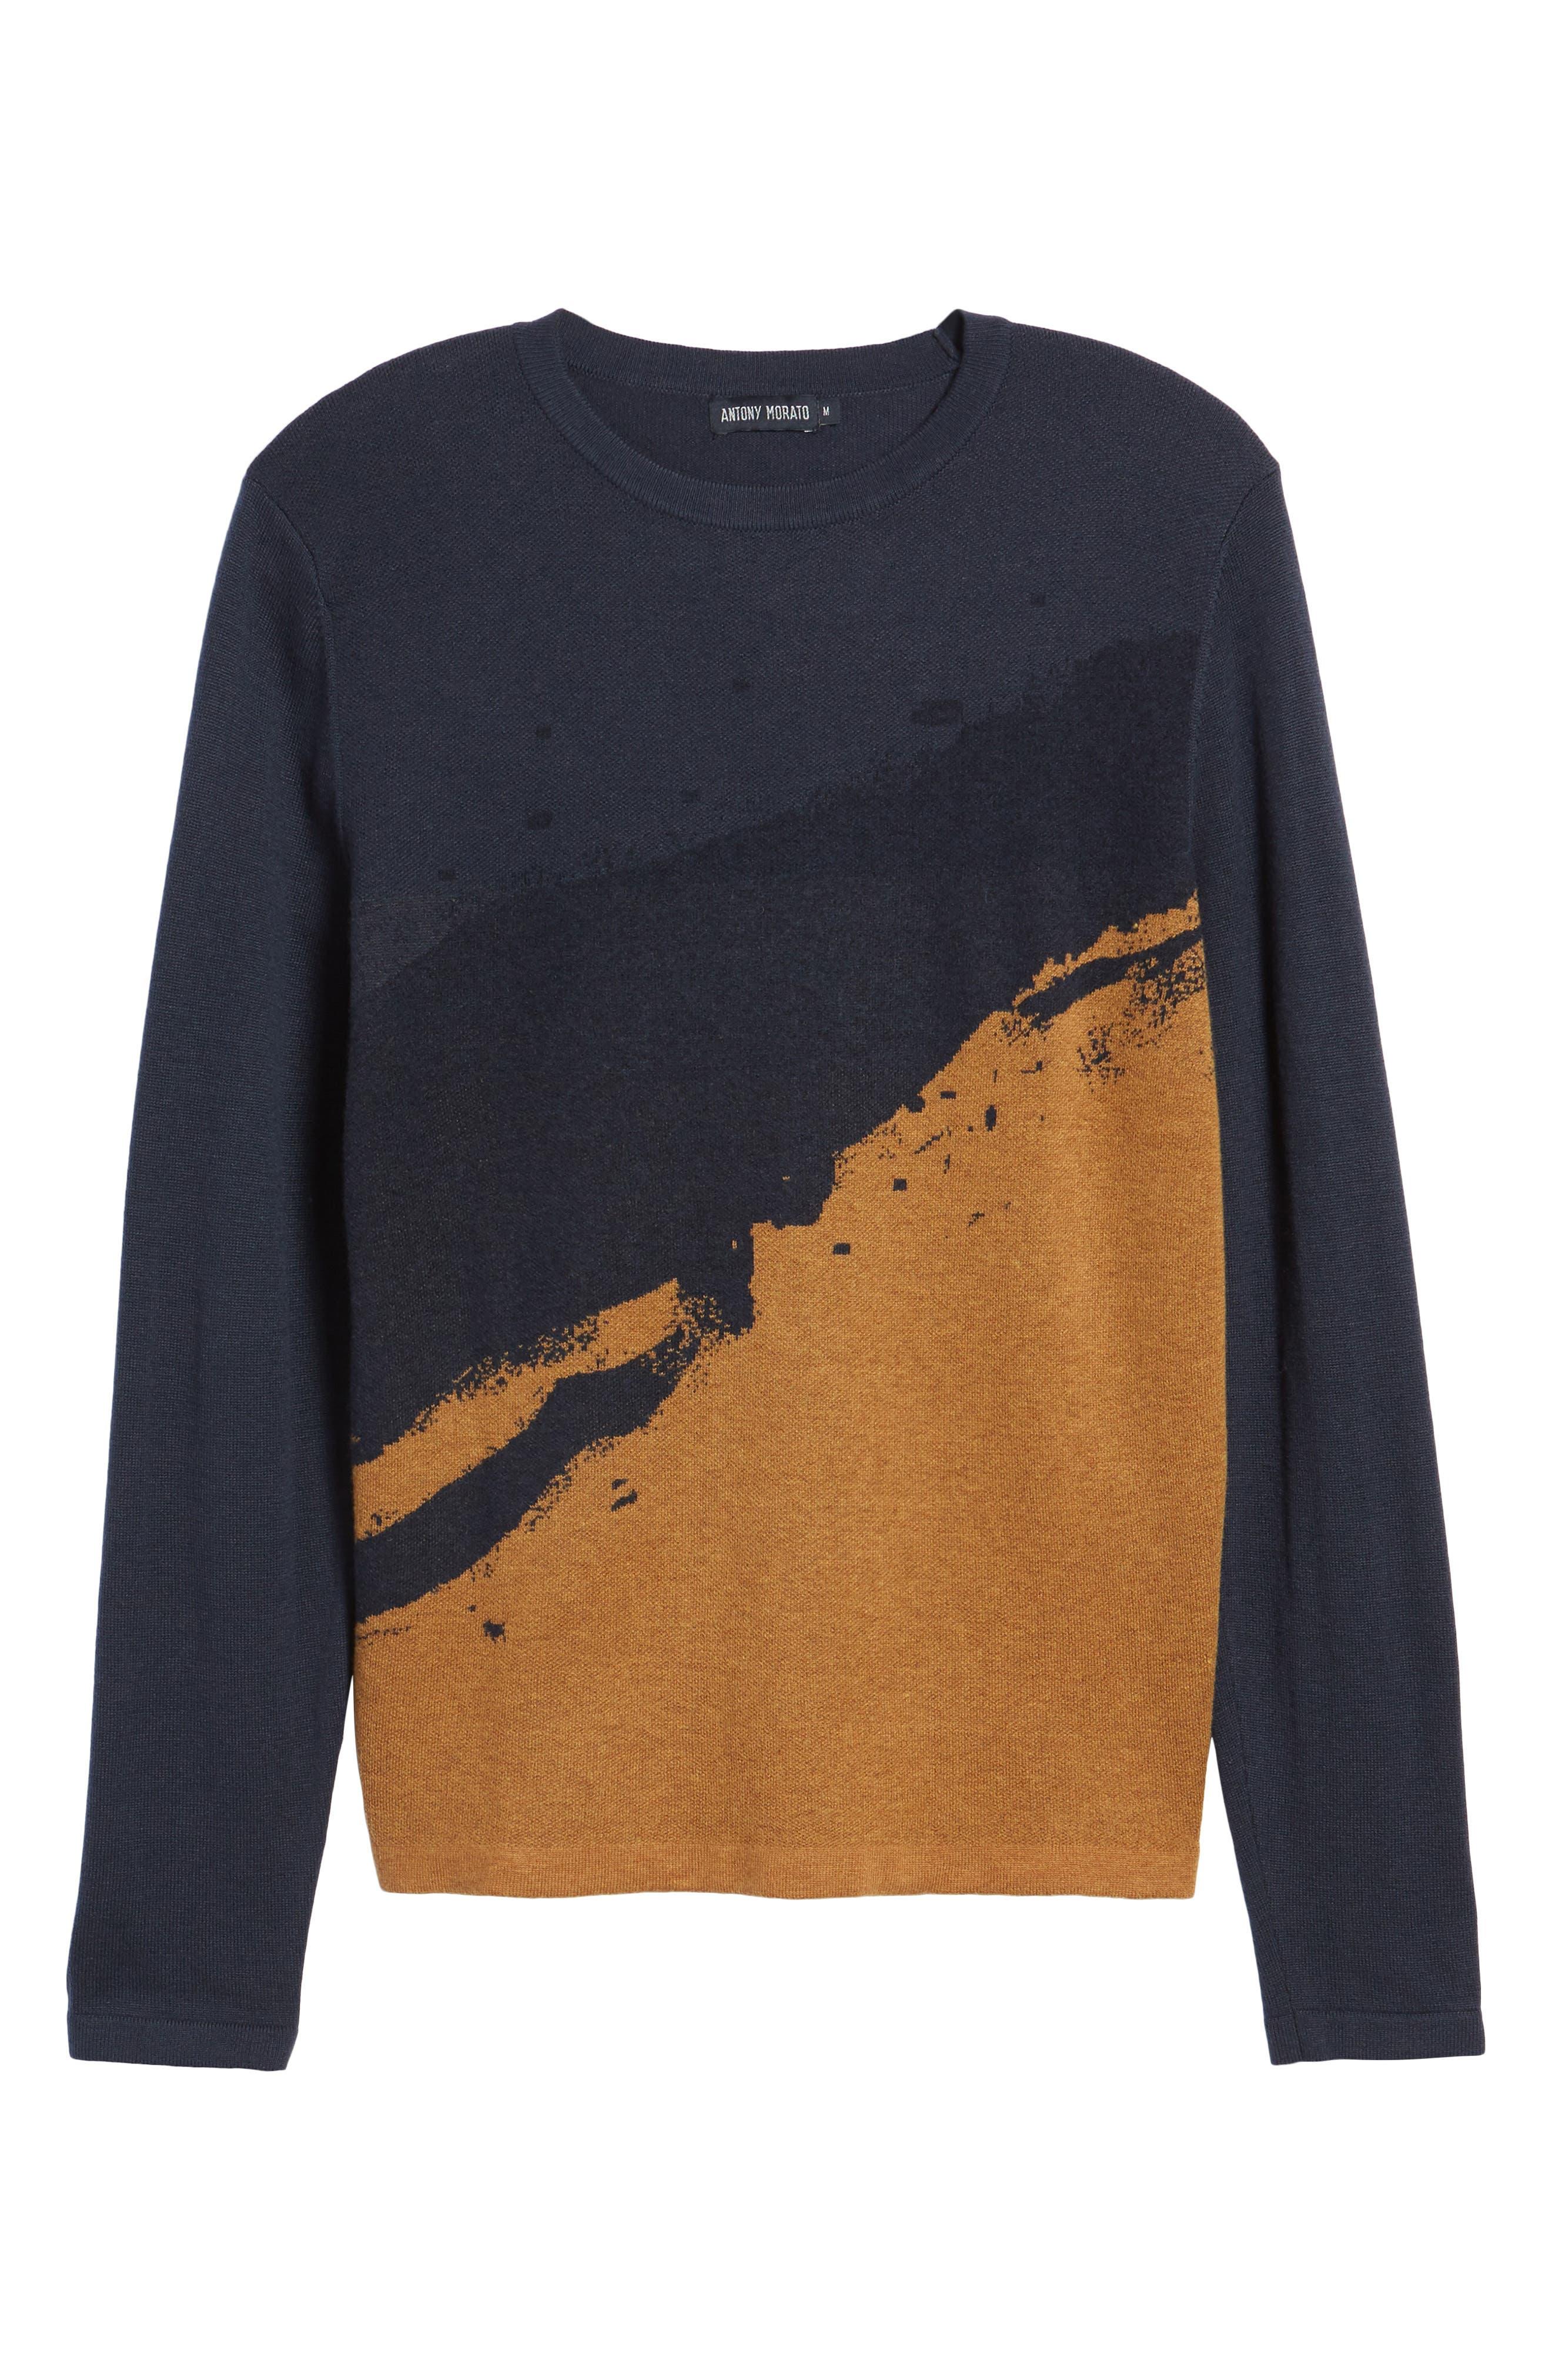 Anotny Morato Pattern Sweater,                             Alternate thumbnail 6, color,                             Soft Blue